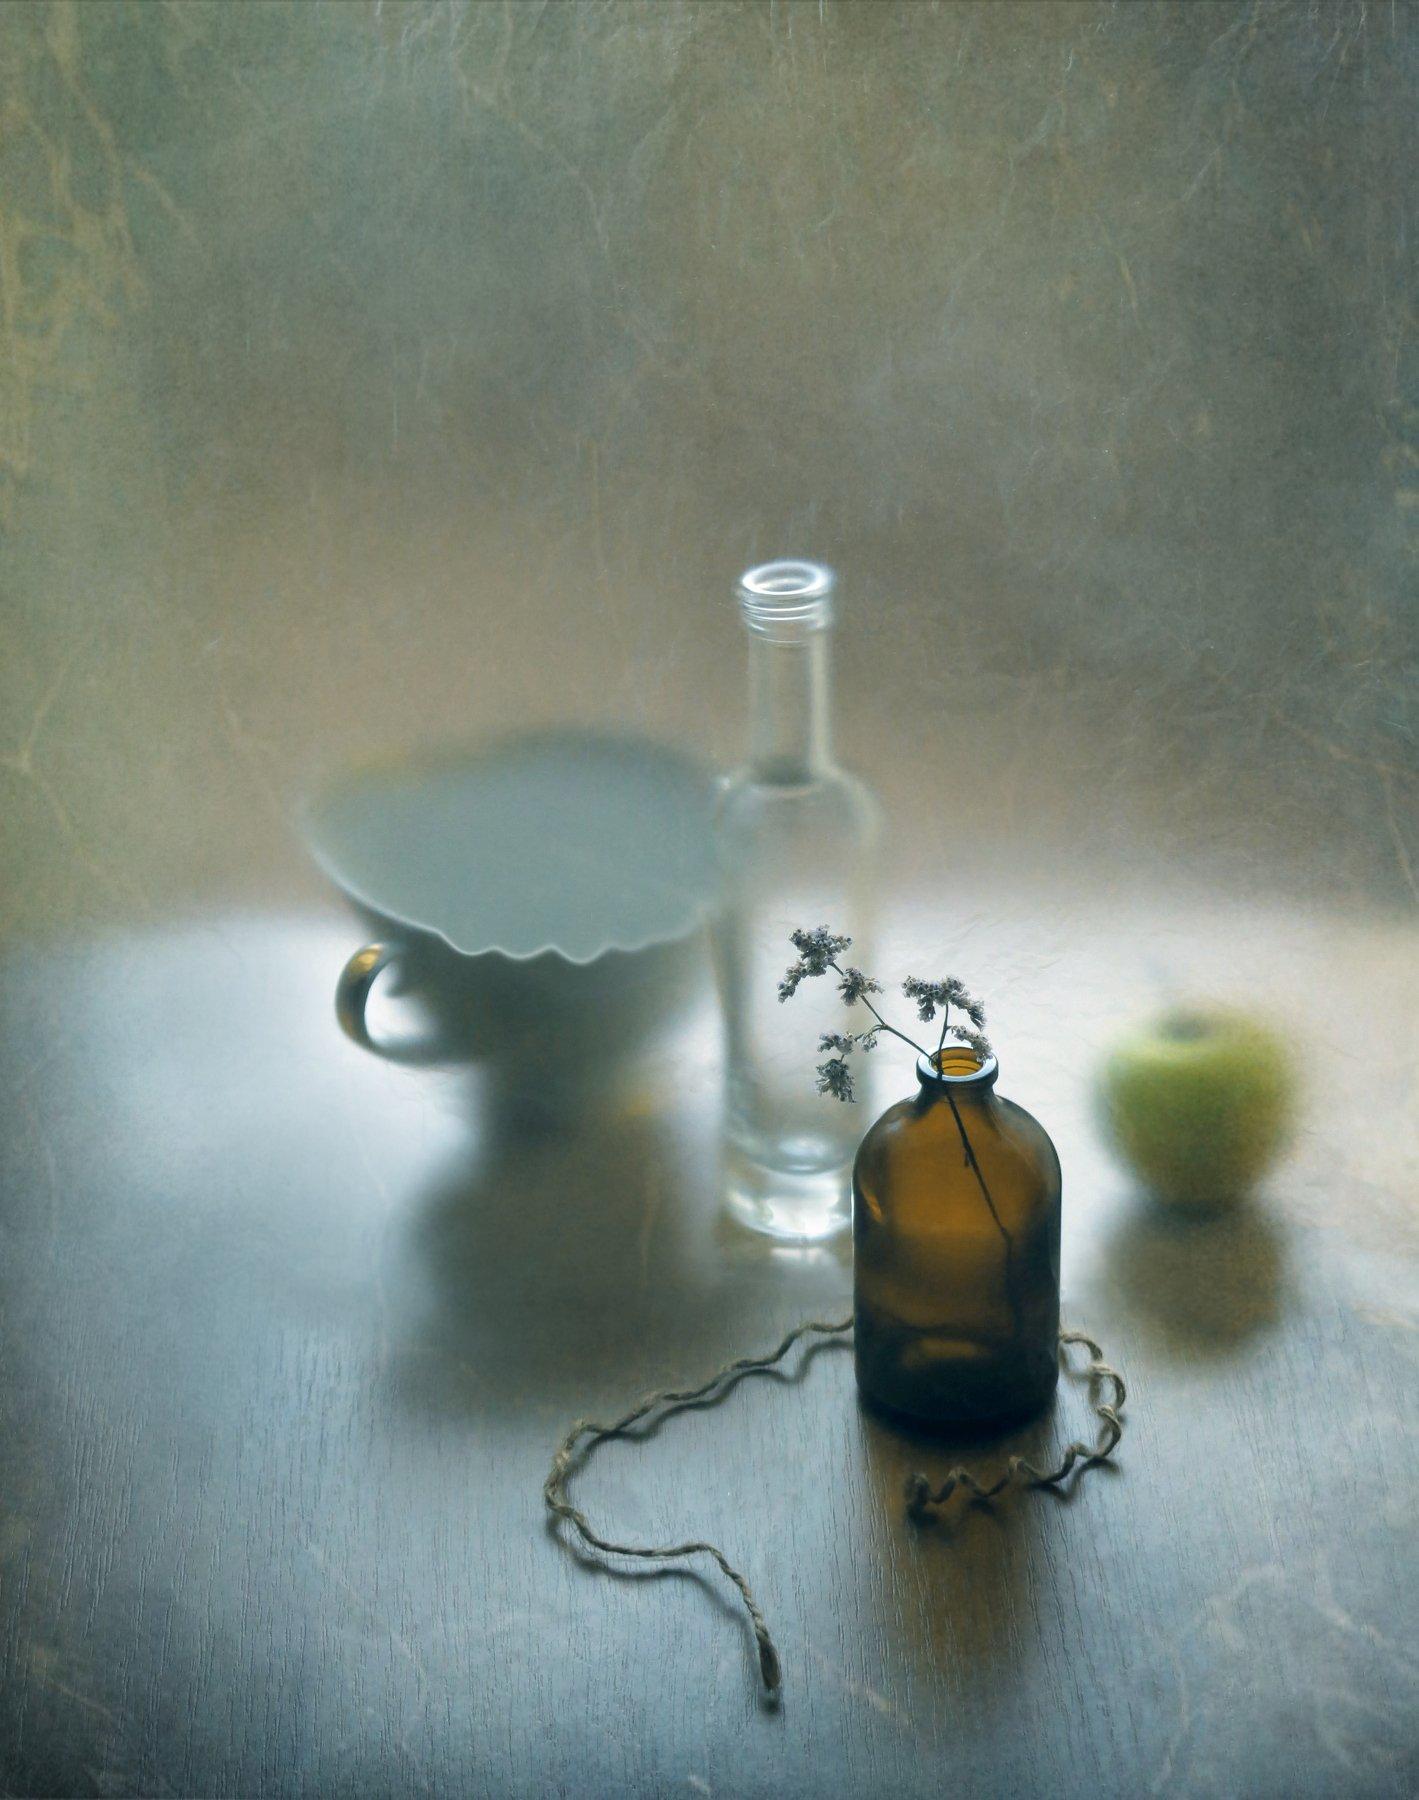 бутылочка, яблоко, травинка, Елена Лысенко